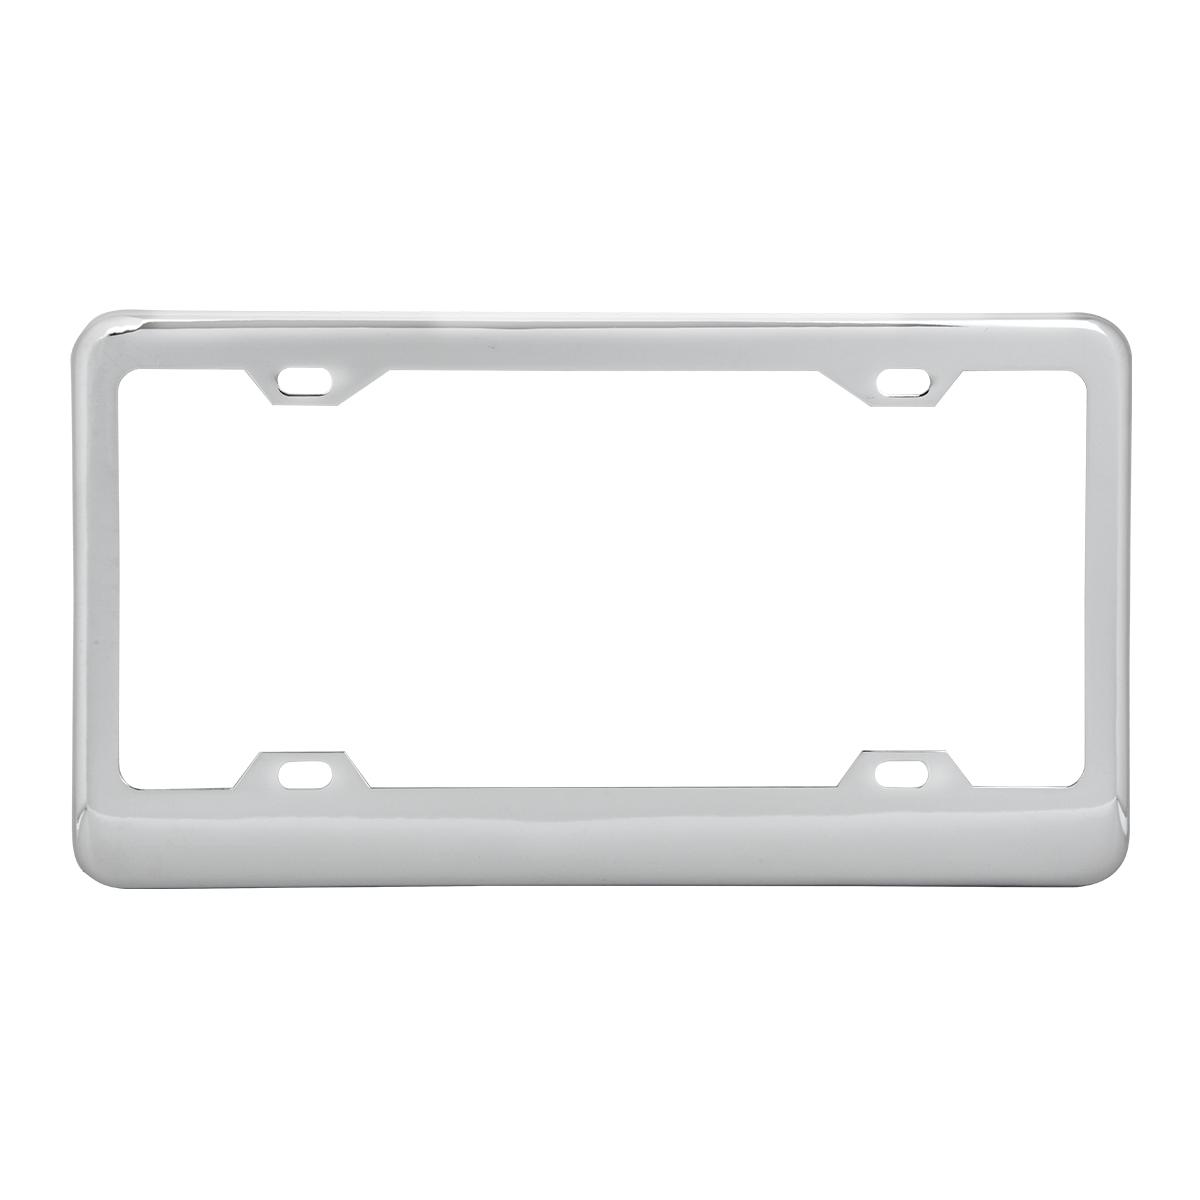 60050 Classic Chrome Plastic Steel 4-Hole License Plate Frames